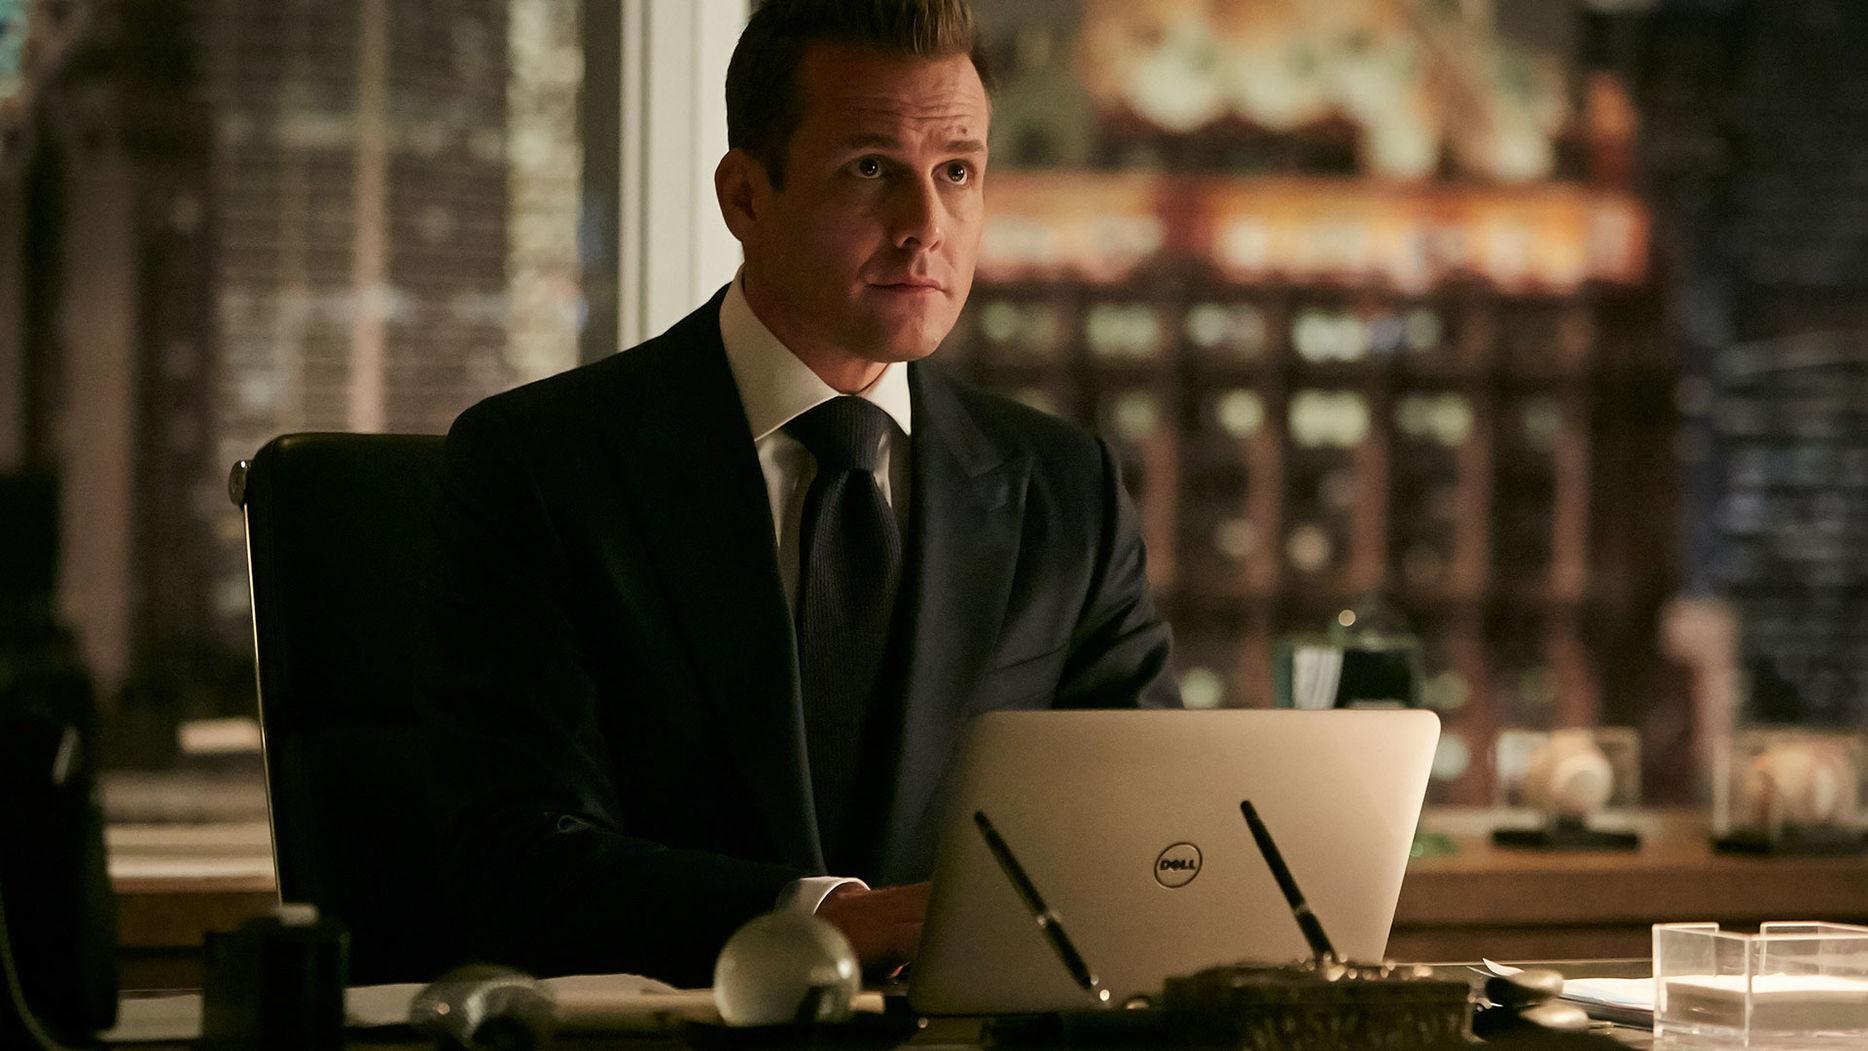 File:S06E06Promo13 - Harvey.jpg